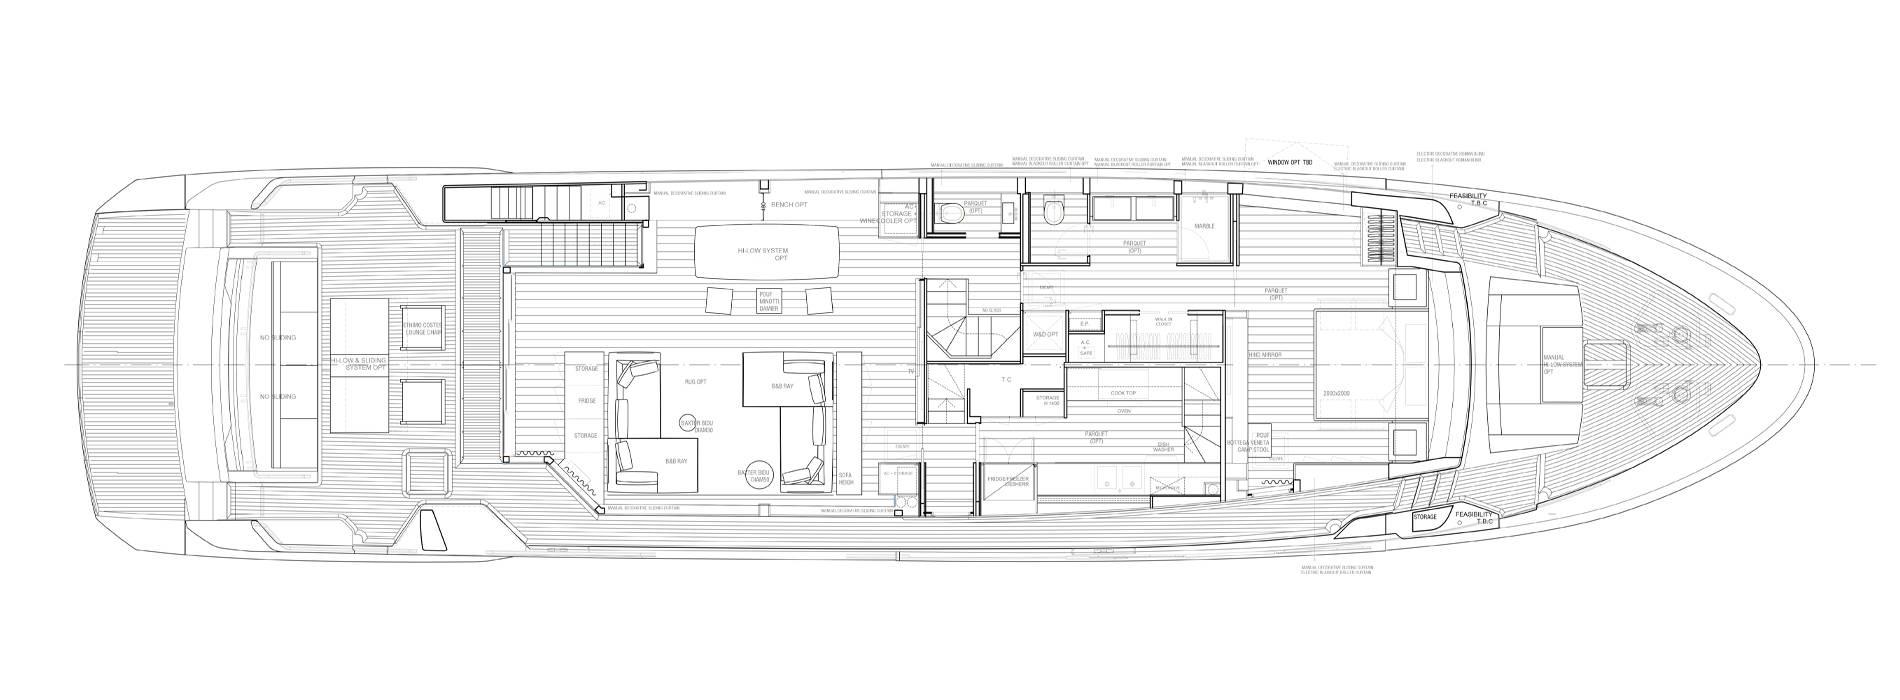 Sanlorenzo Yachts SL102A-746 under offer Pont principal